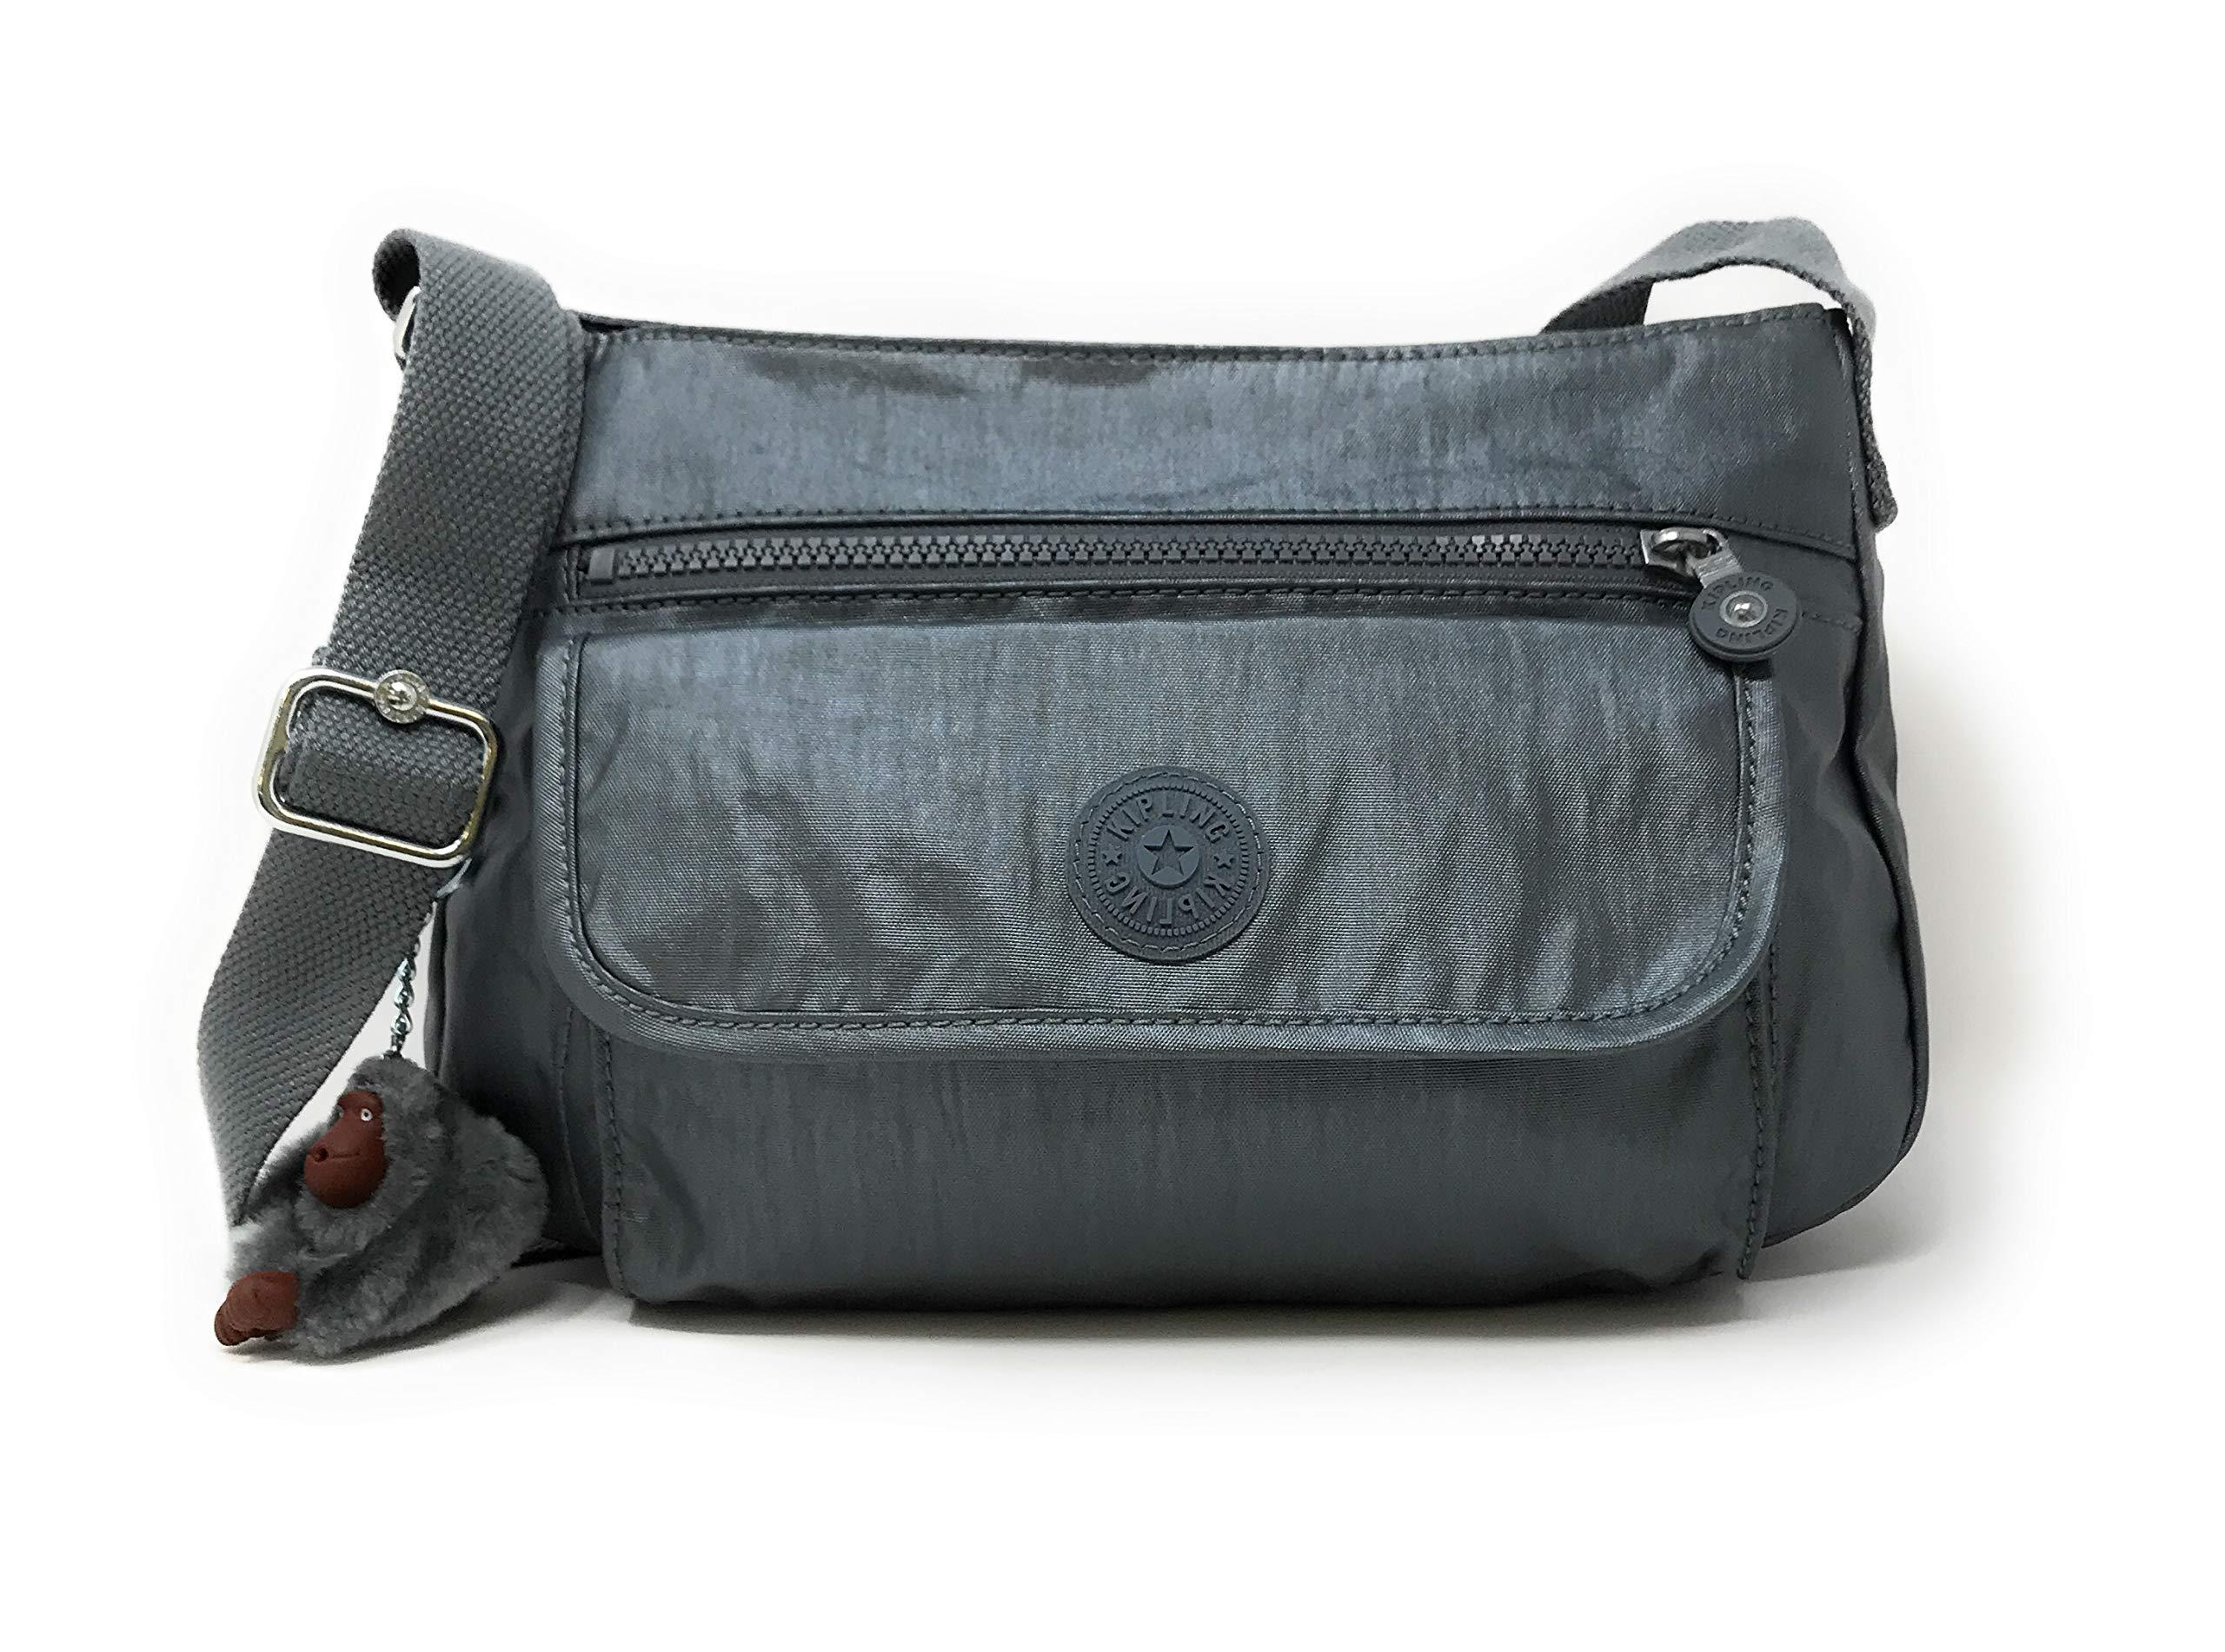 Kipling Syro Crossbody Bag (One Size, Steel Grey Metallic)